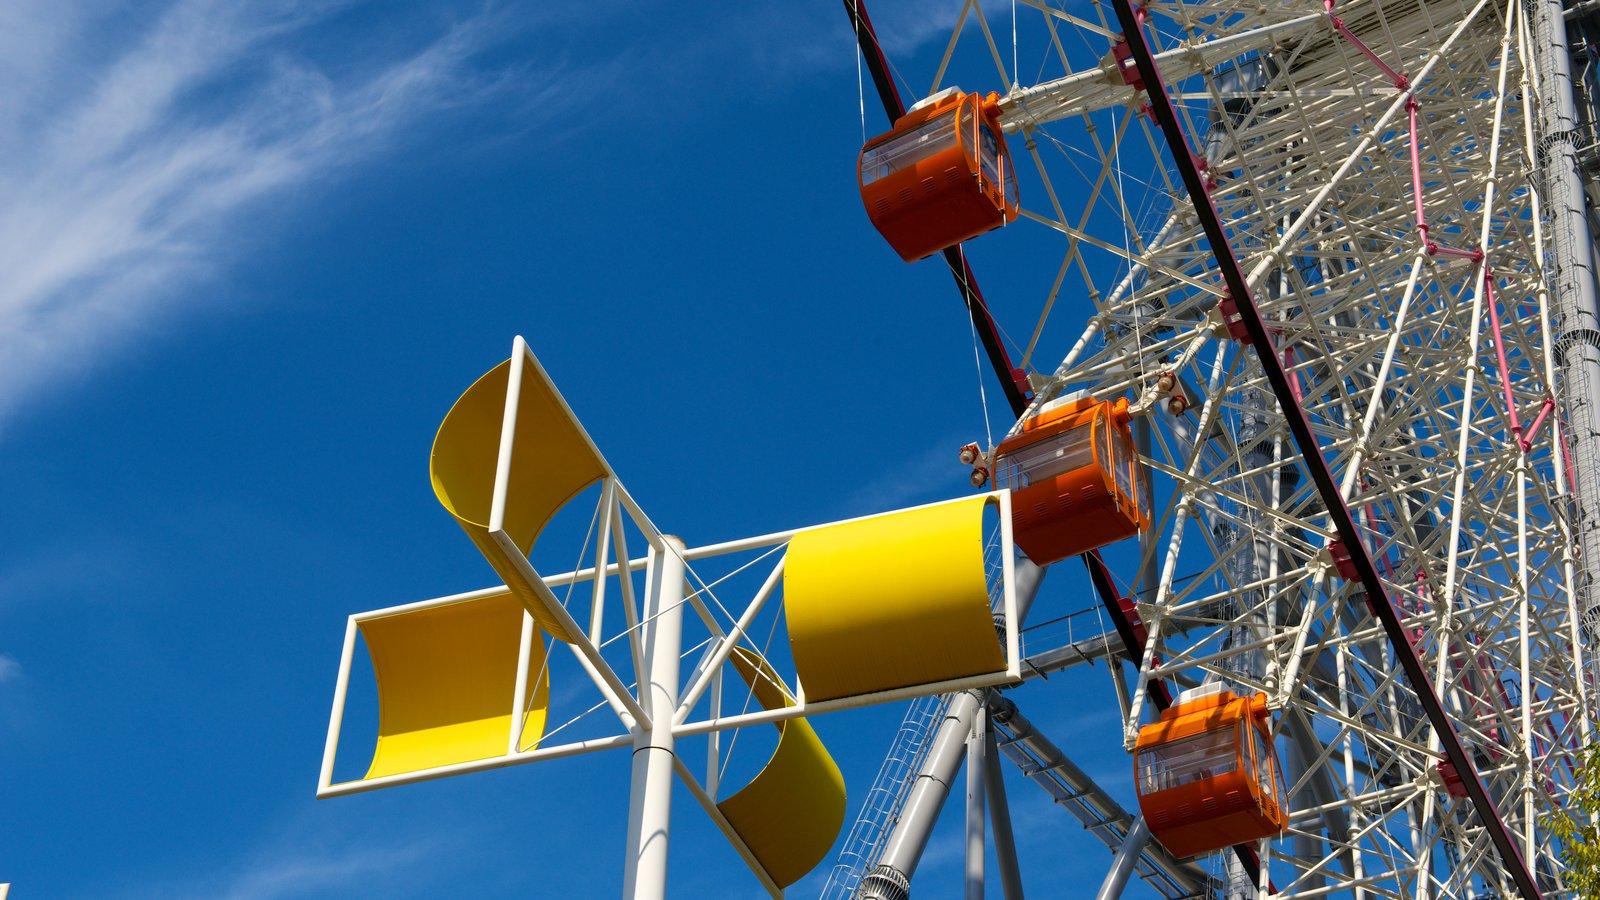 Tempozan Ferris Wheel, Osaka